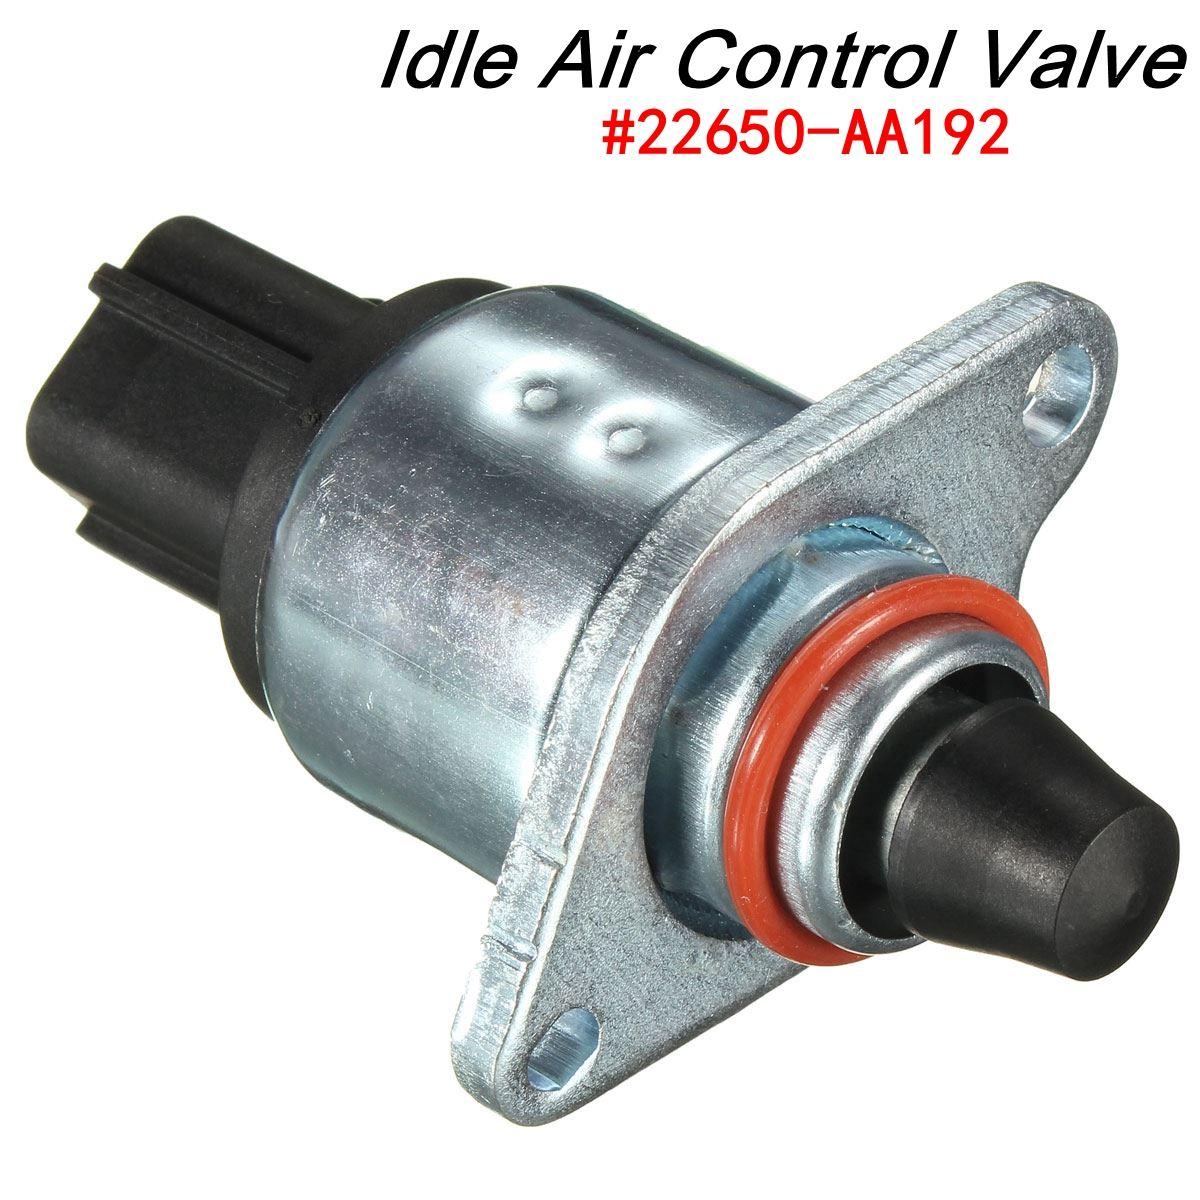 Car Part Idle Air Speed Control Valve For 2650AA192 22650AA19C A33 661 R02 IAC